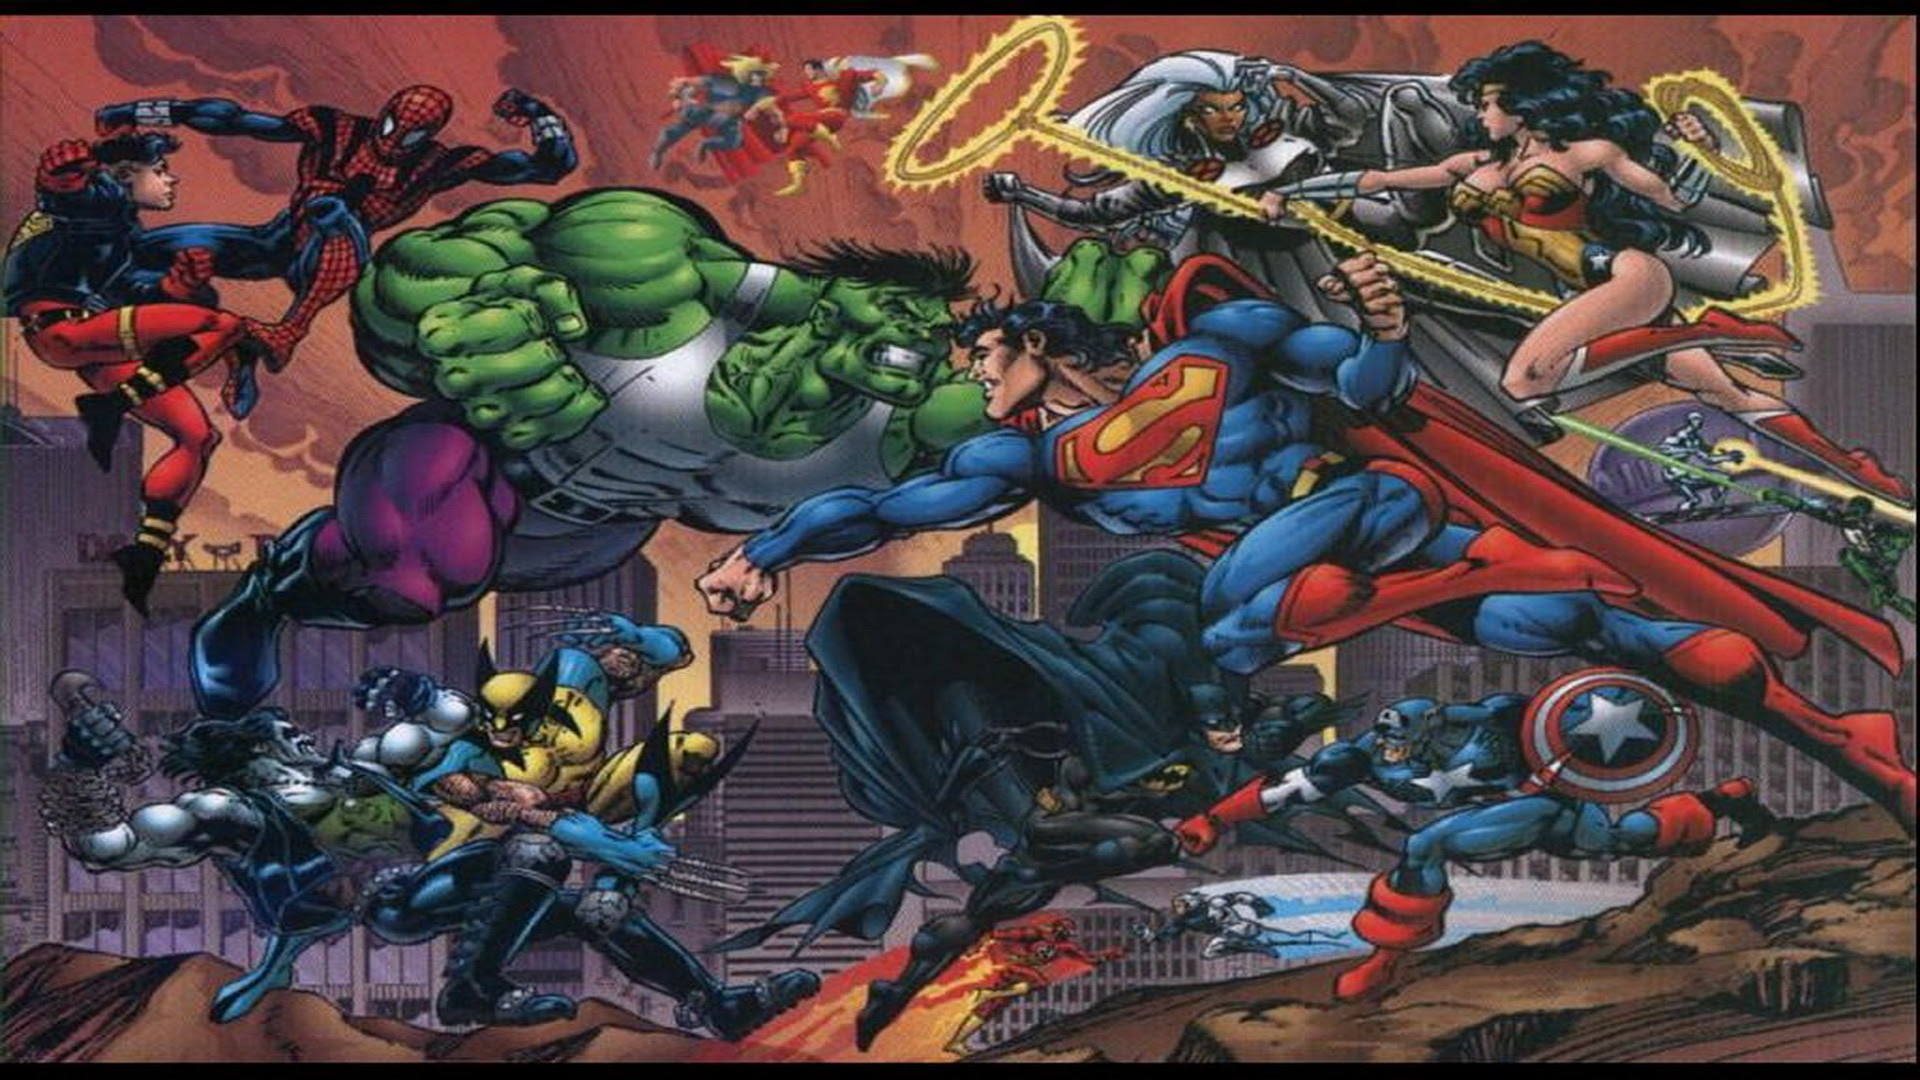 More Marvel Vs Dc Wallpapers Marvel Comics Action Scenes